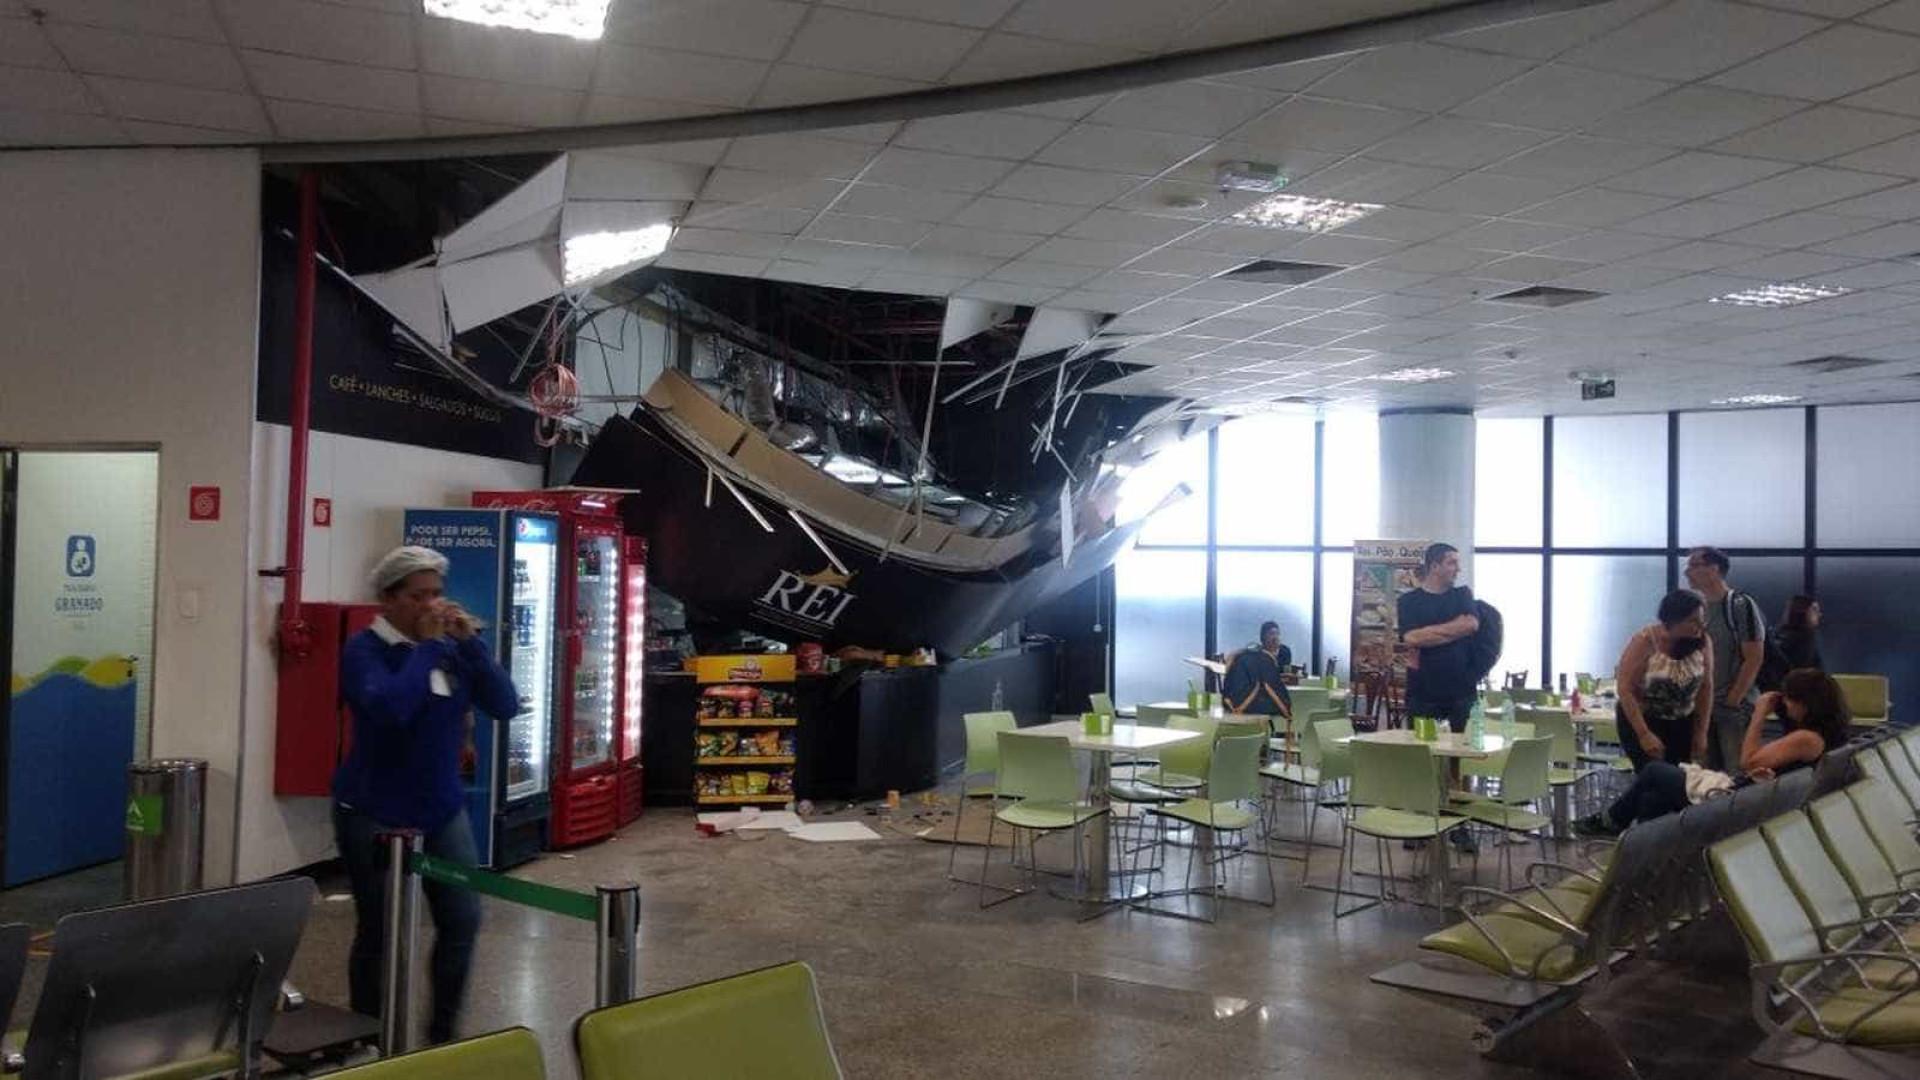 Teto do Aeroporto de Brasília desaba na área de embarque